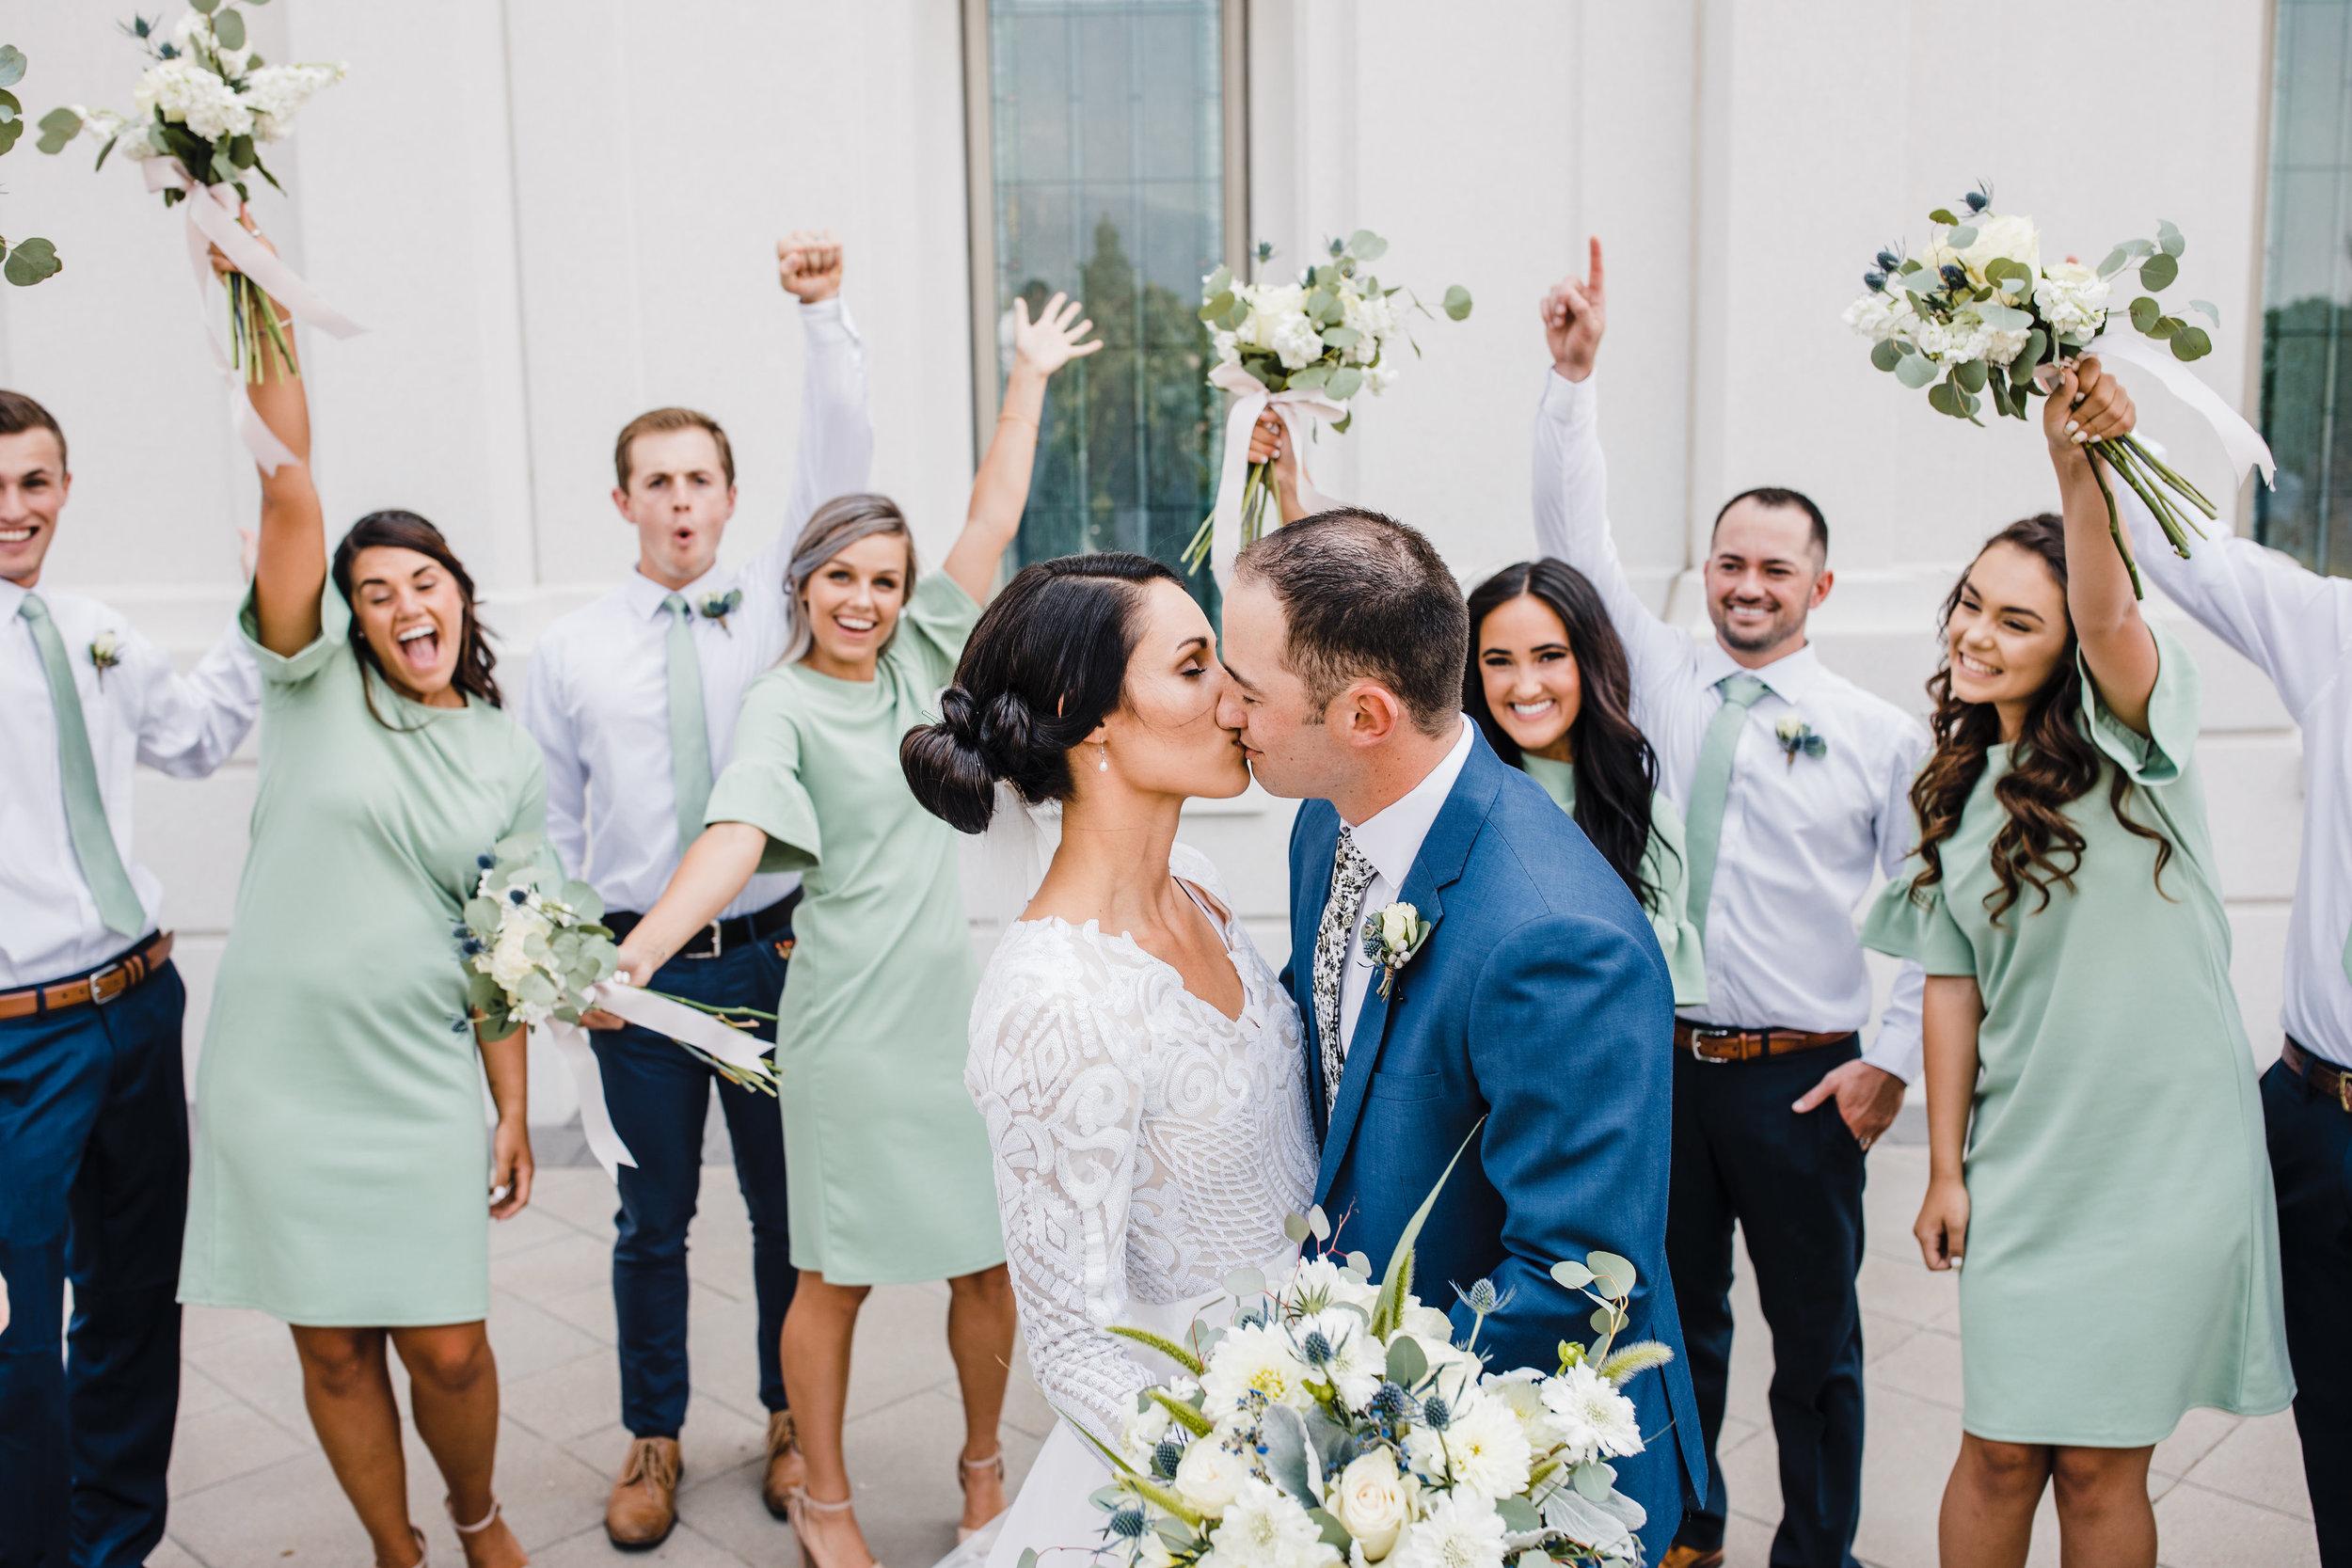 brigham city utah wedding photographer bridal party groomsmen green bridesmaids dresses cheering kissing romantic